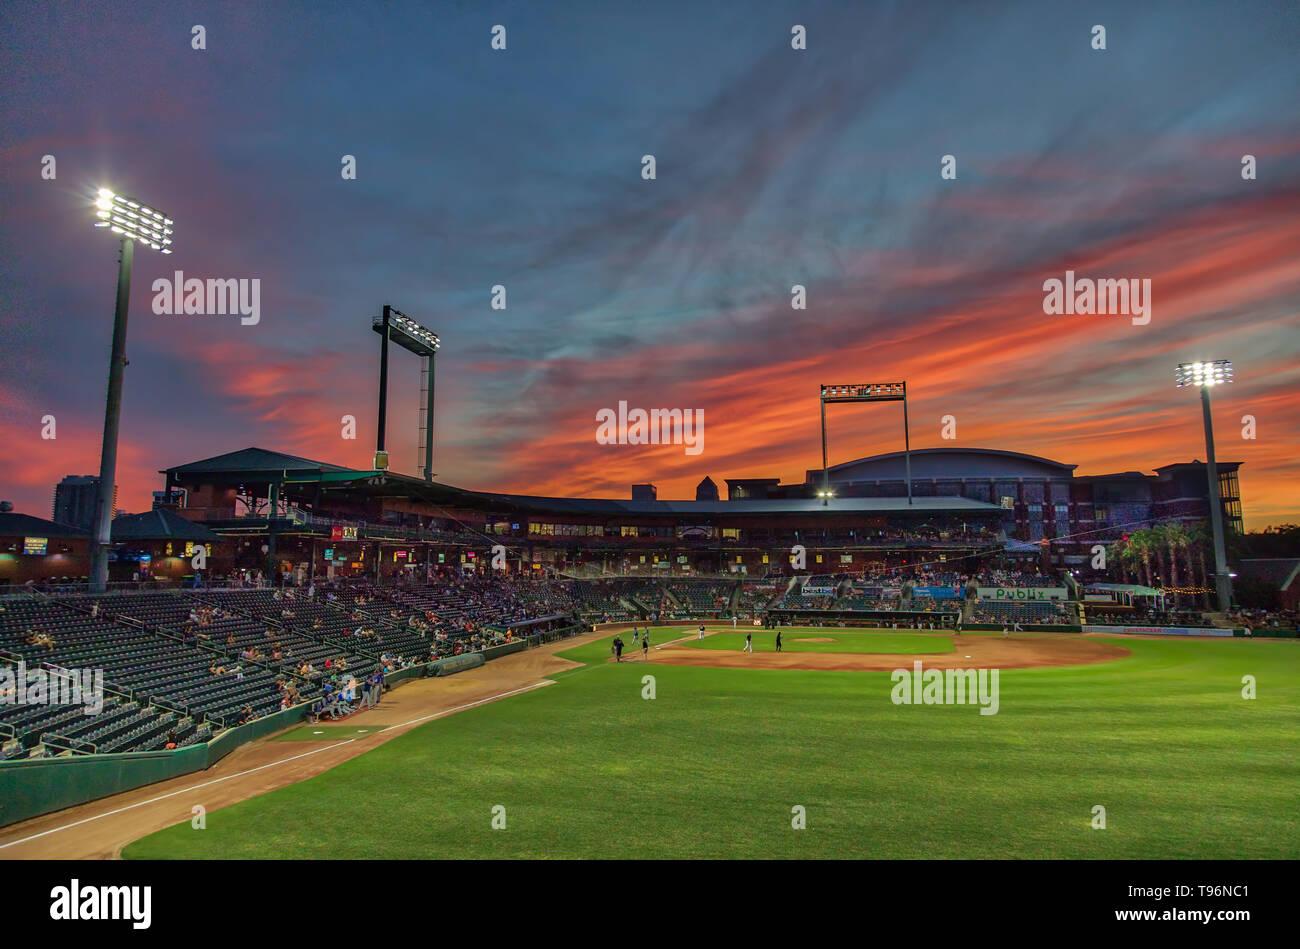 Baseball Grounds Sunset Stock Photo